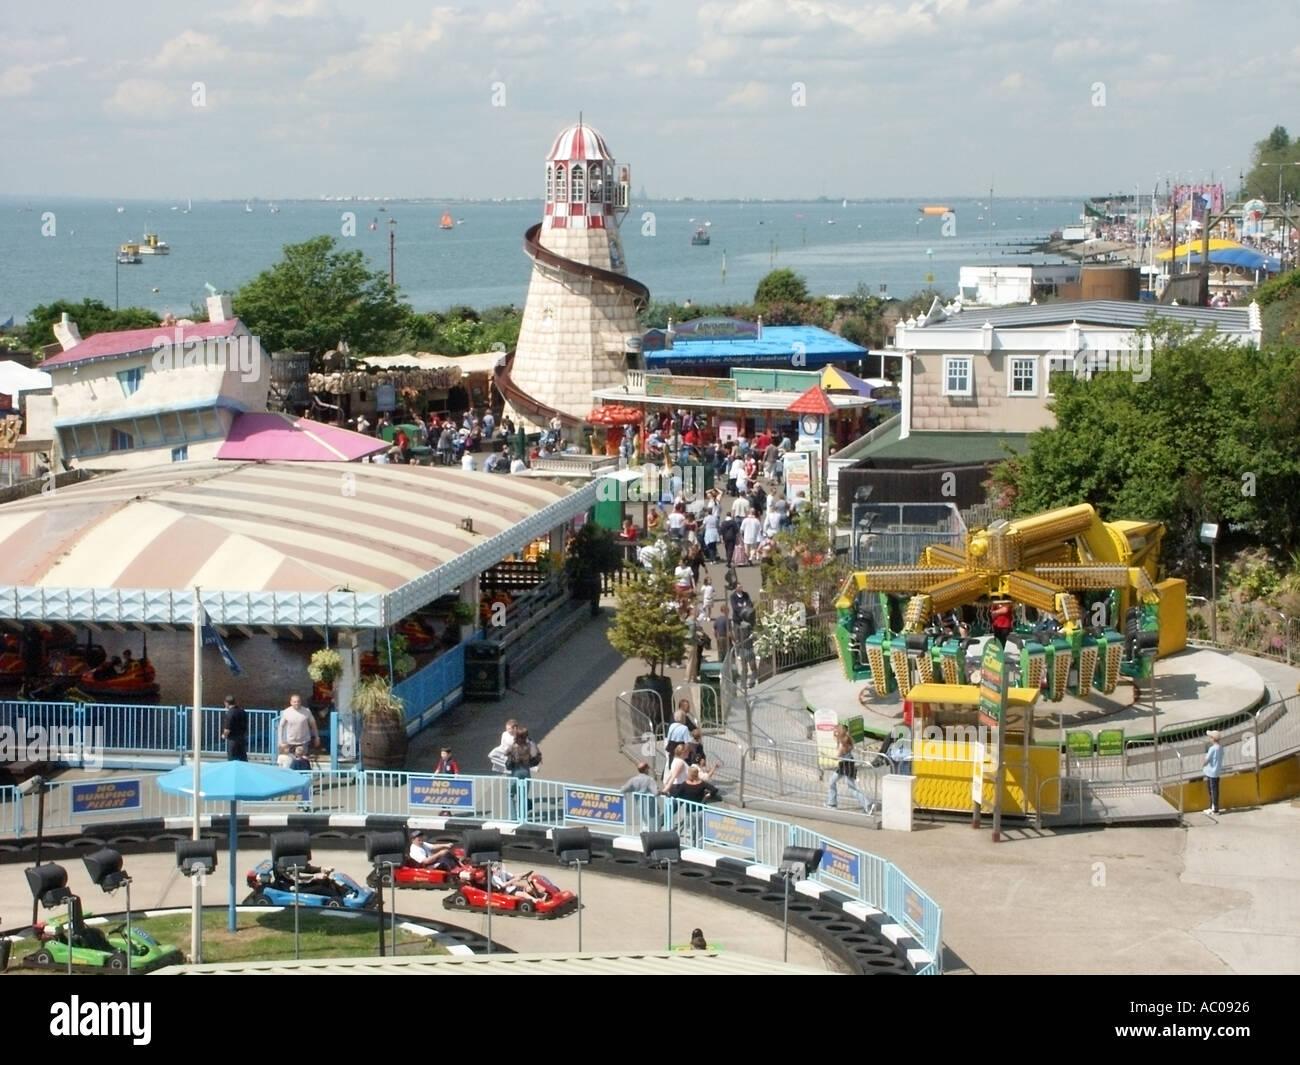 Southend on Sea seaside resort beside River Thames estuary Adventure Island pleasure park and funfair - Stock Image